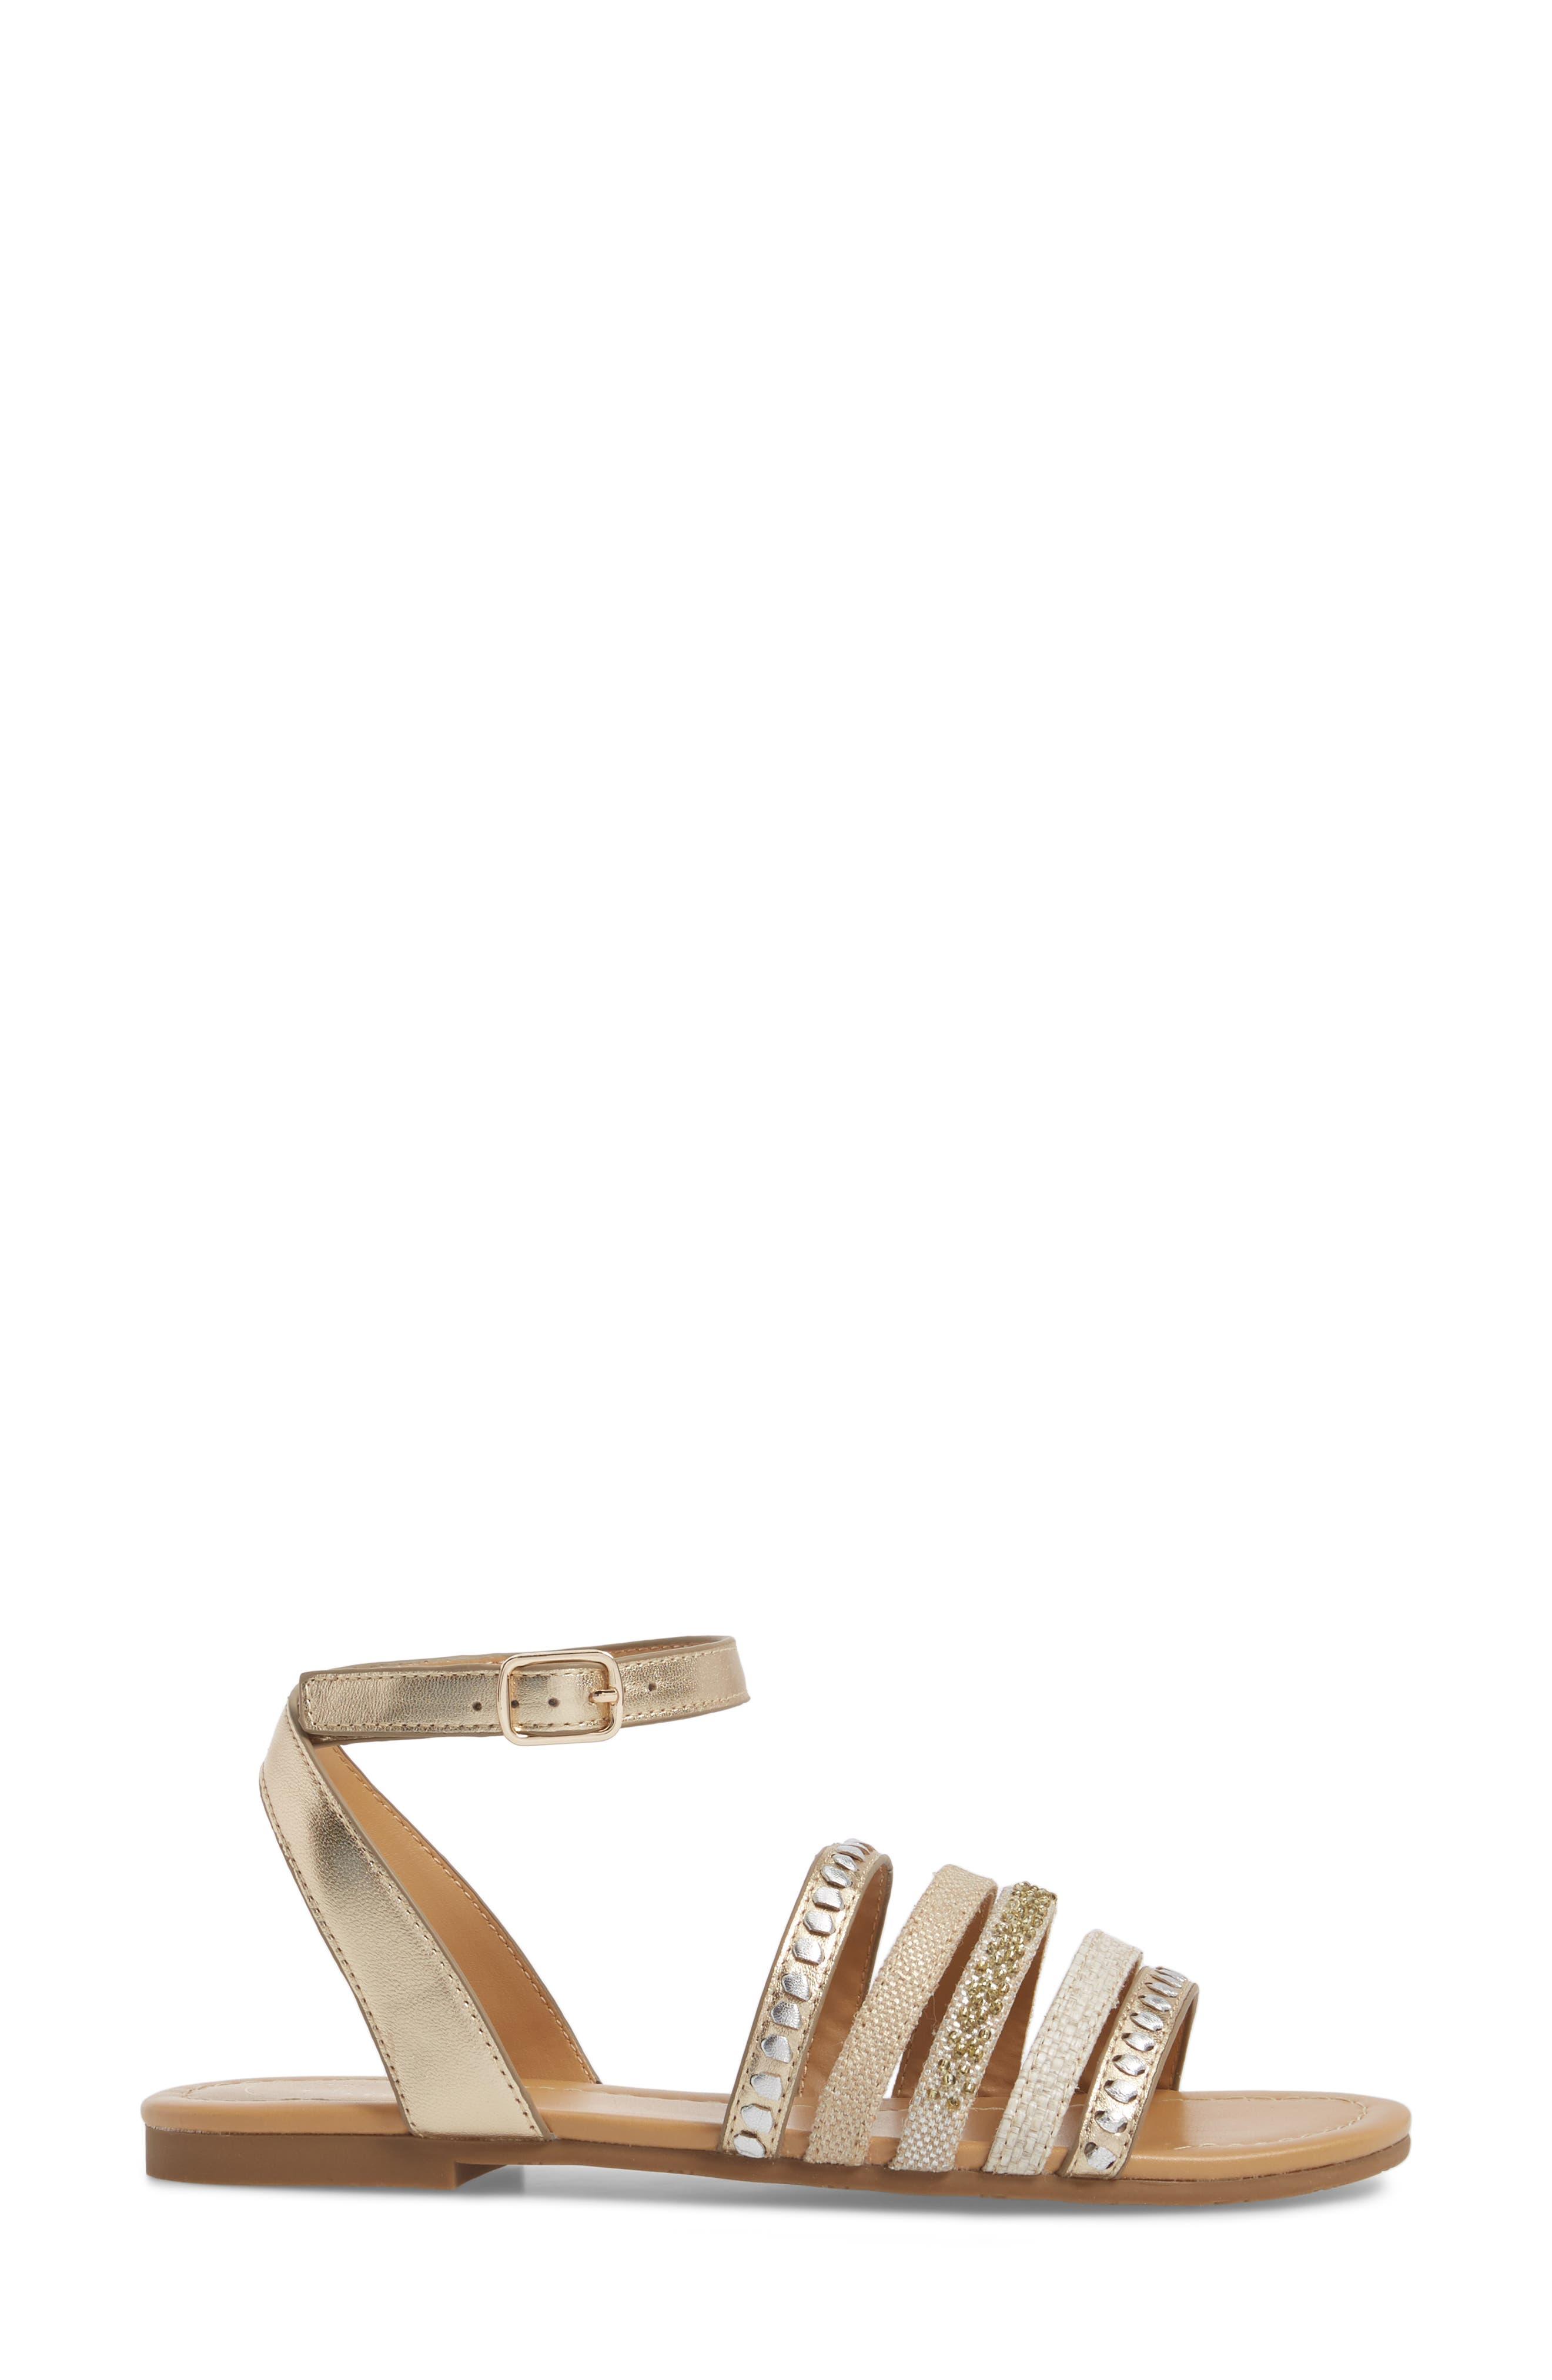 Hannah Braided Embellished Sandal,                             Alternate thumbnail 3, color,                             Platinum/ Silver Leather